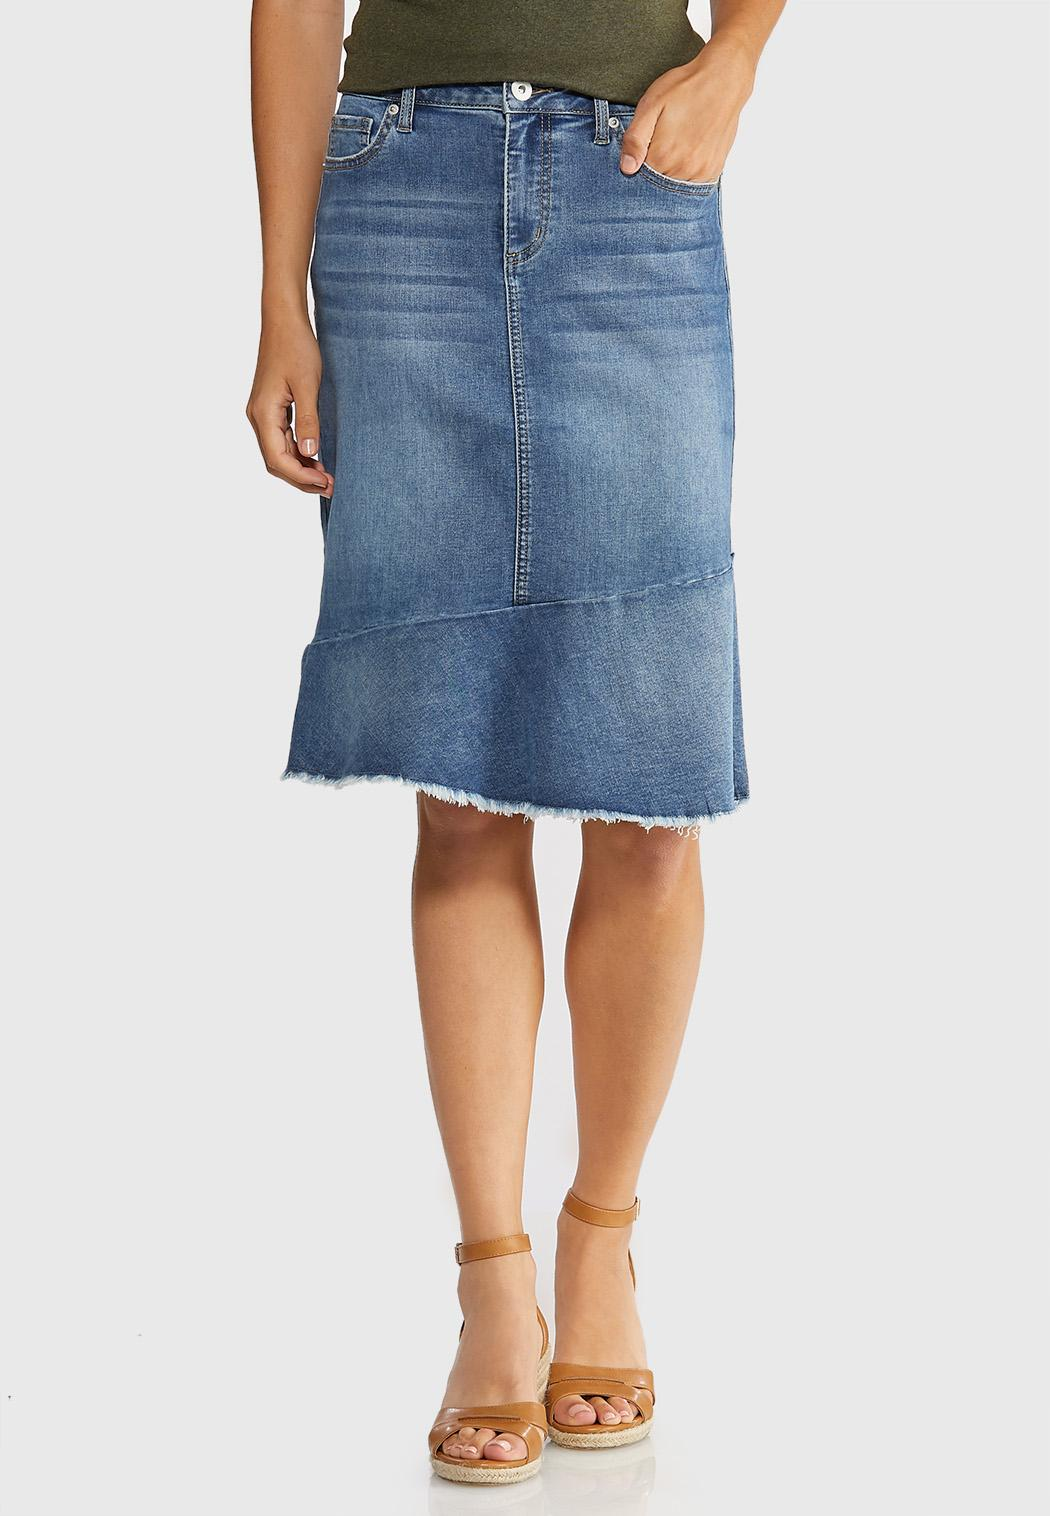 Plus Size Fringed Denim Skirt